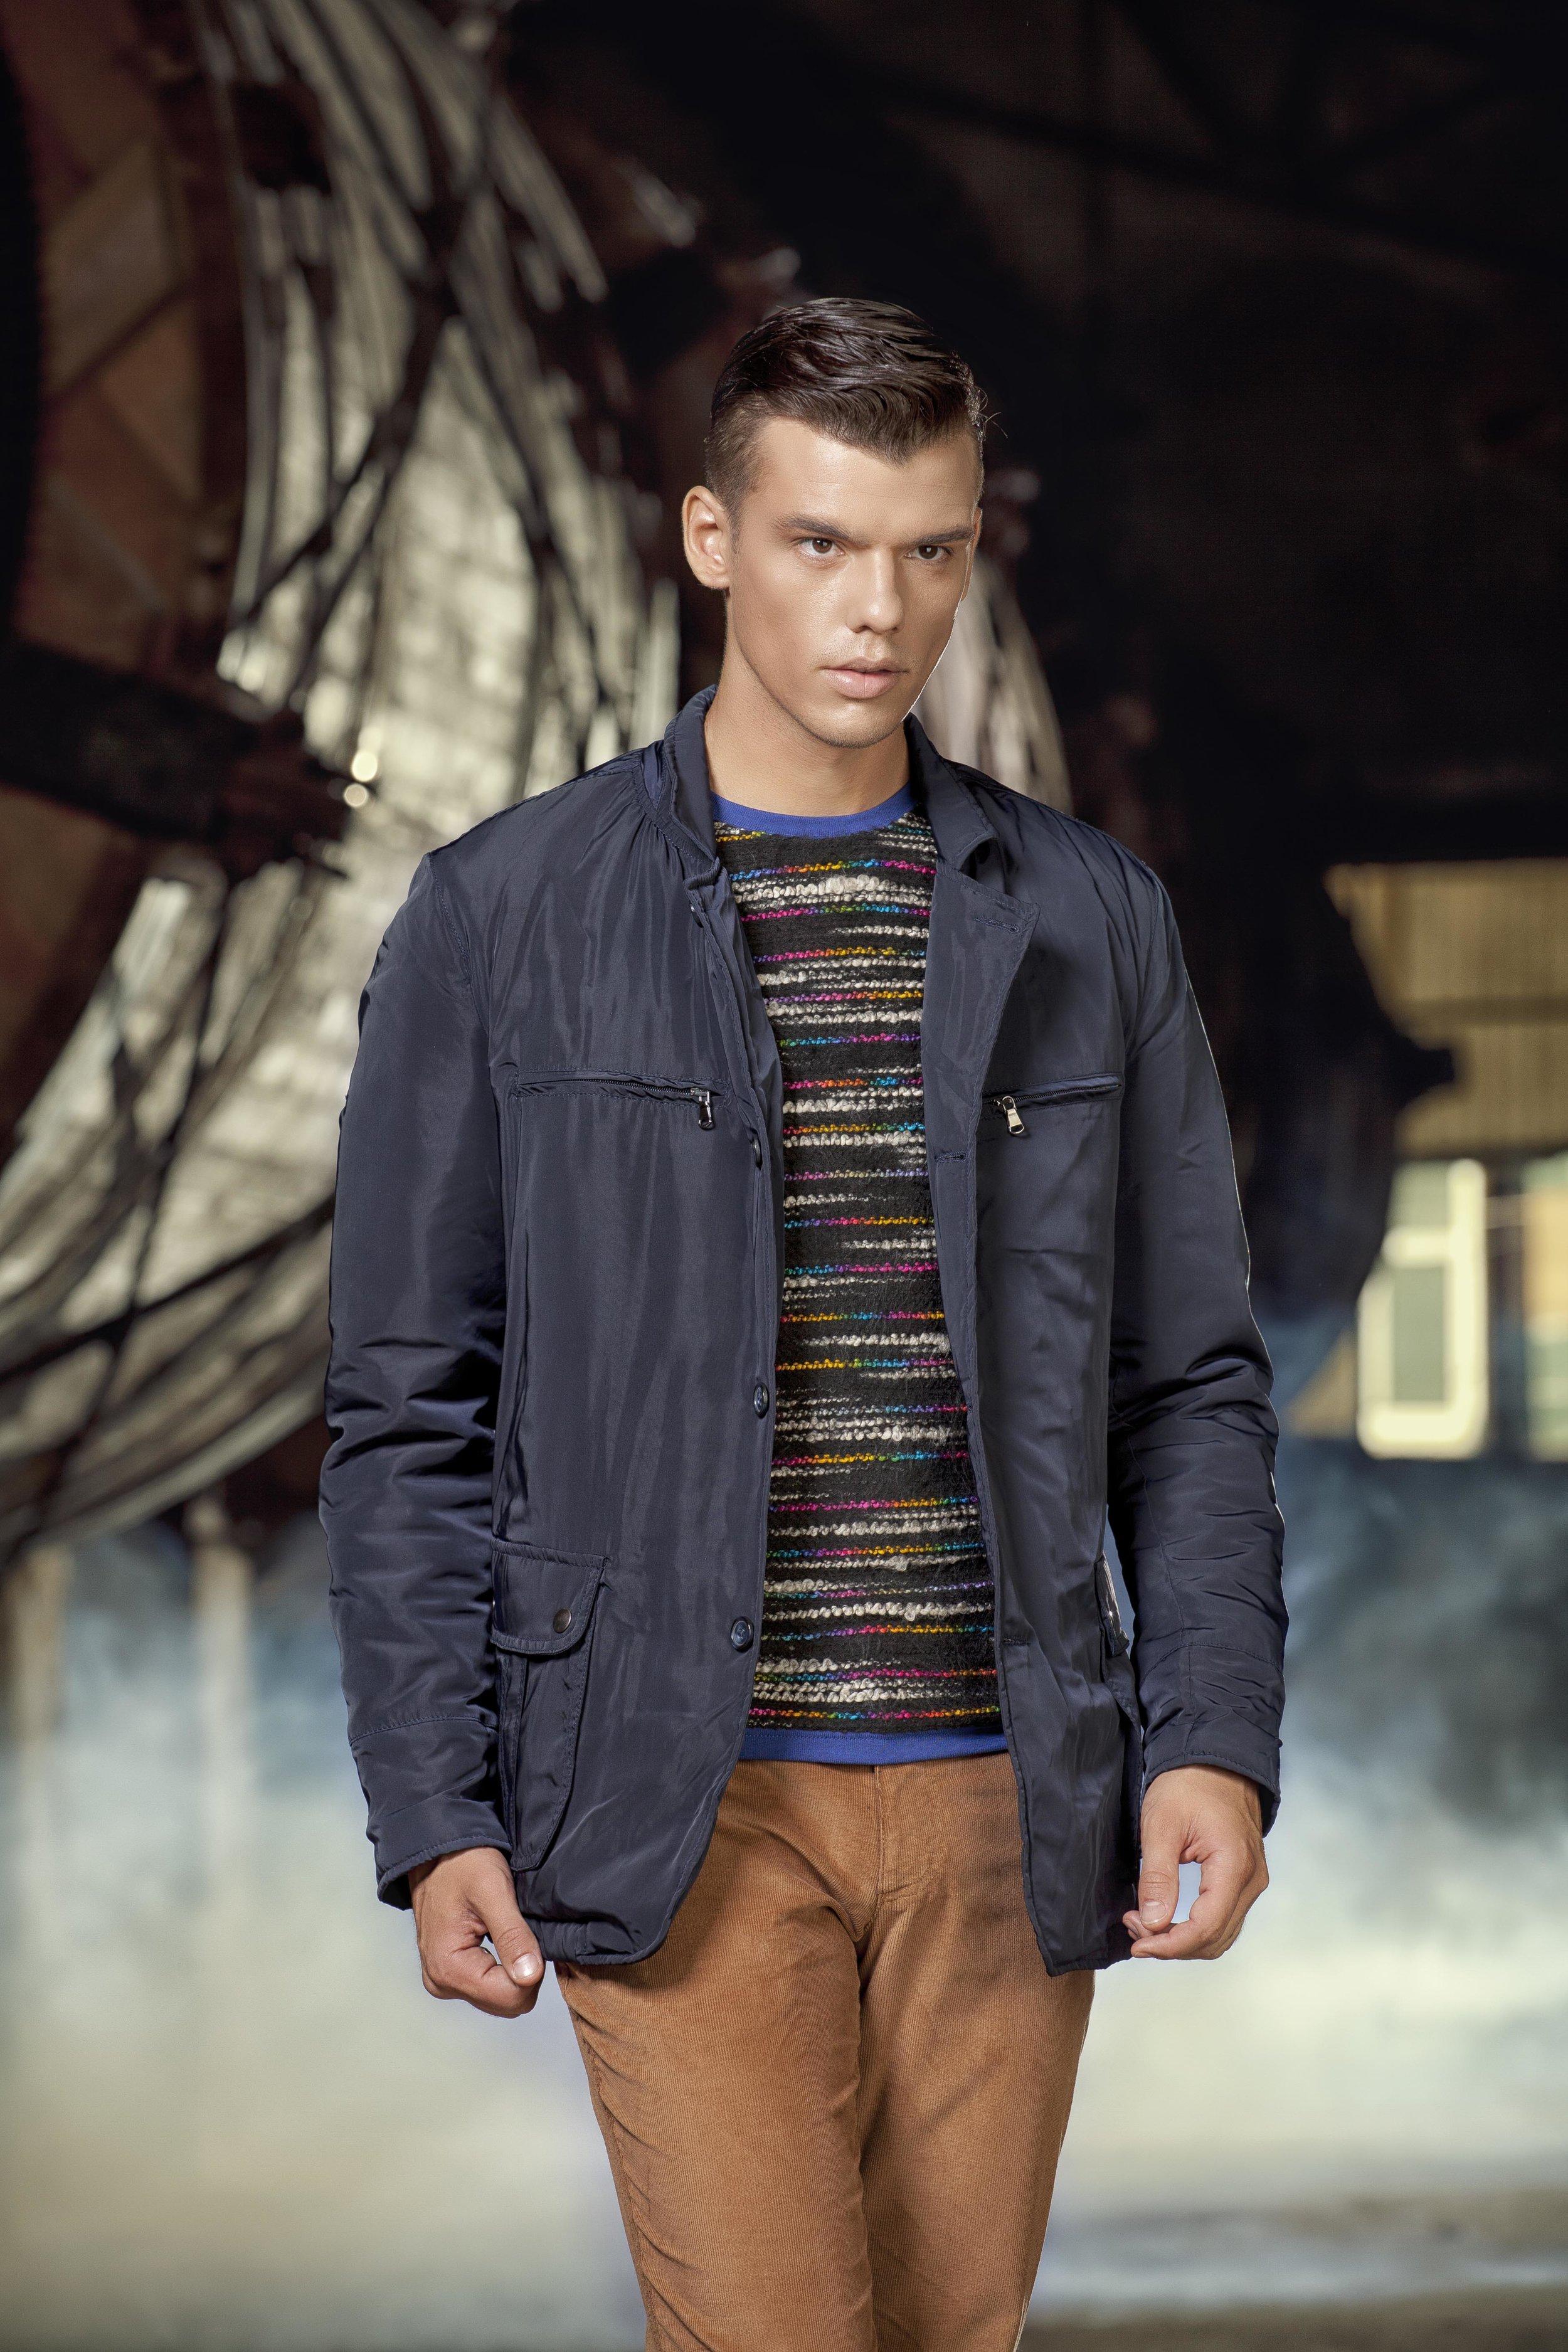 Ugur_Bektas_Fashion_Moda_fotograf_Set_7_003.jpg